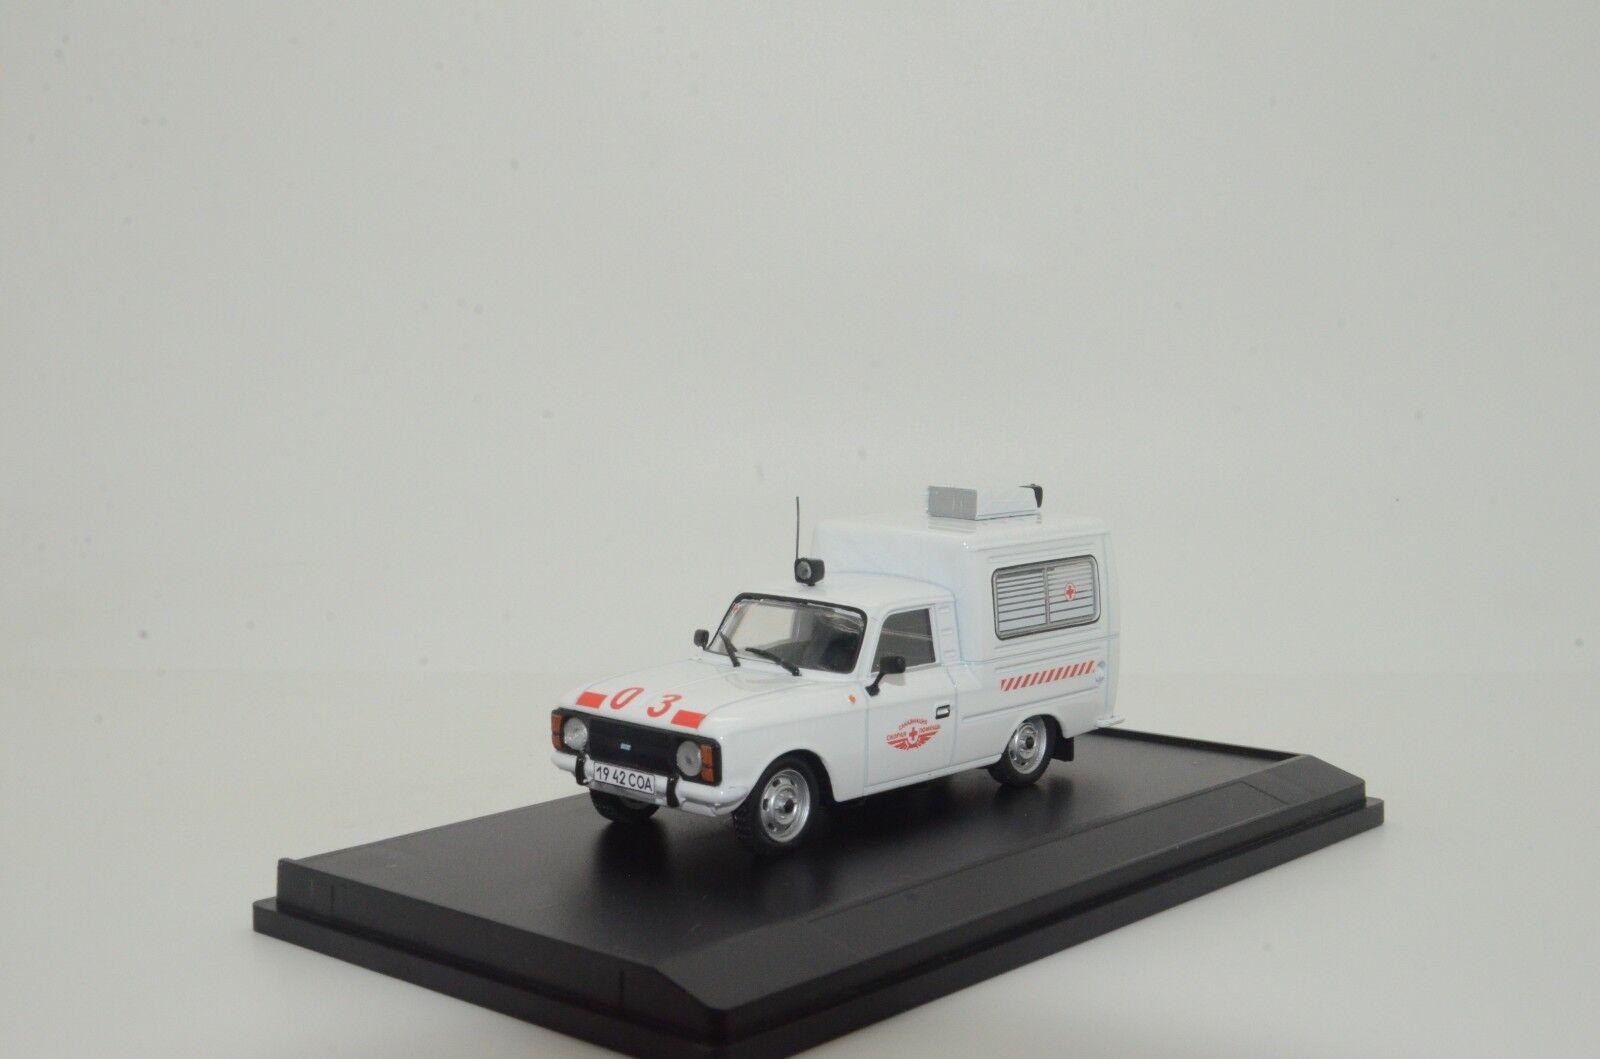 rara Moskvitch ihz 27156 Aero coche ambulancia médica Hecho a Medida 1/43